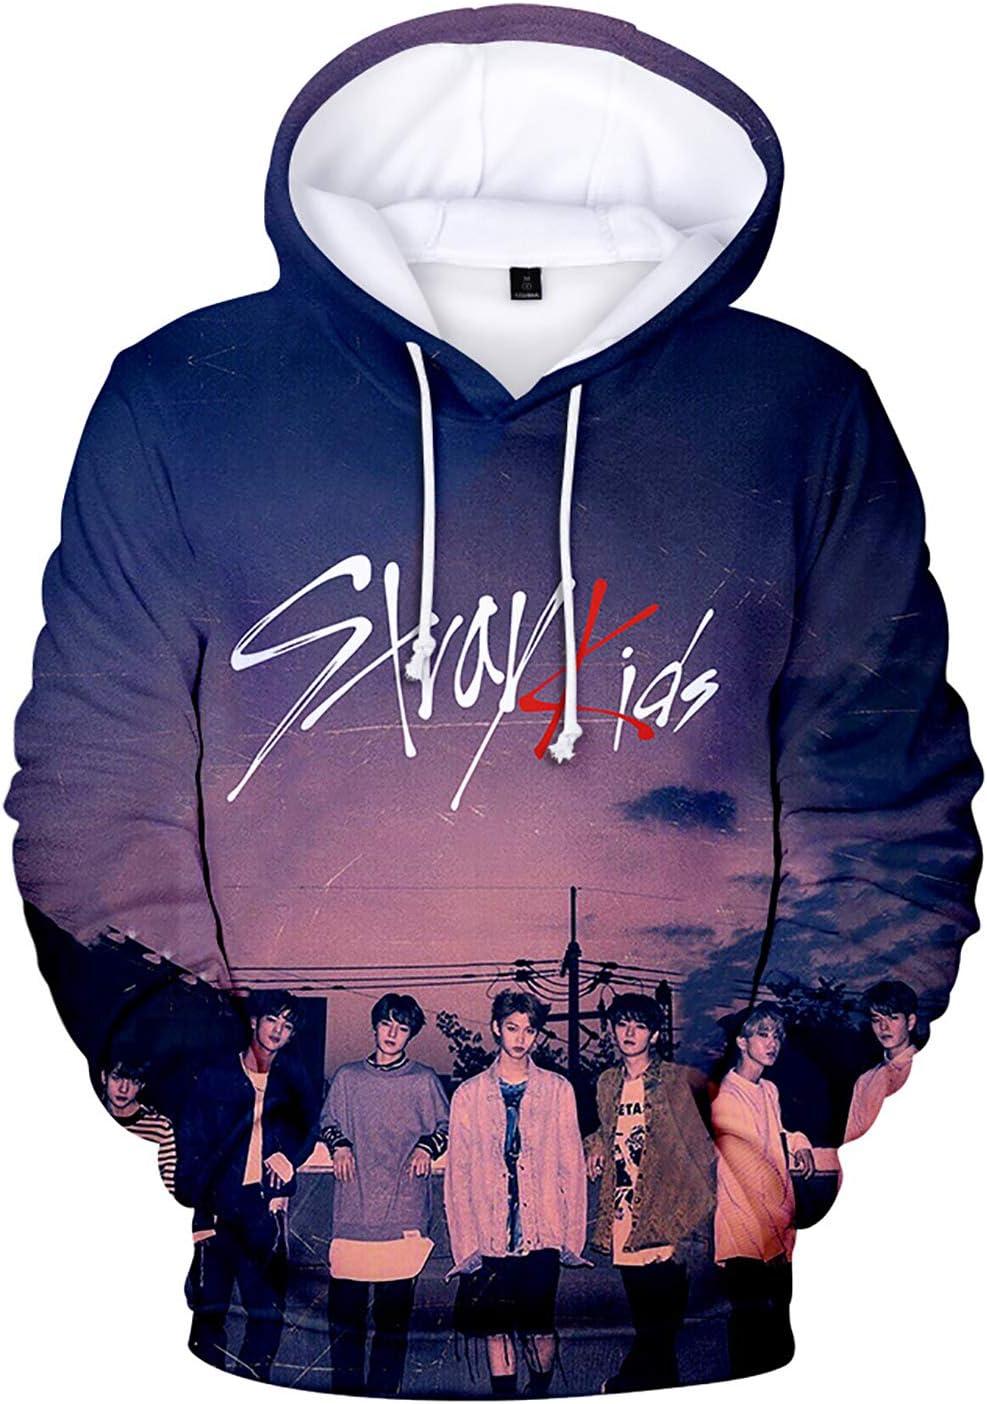 JUNG KOOK Kpop Stray Kids 3D Hoodie Woojin Felix Minho Jisung Sweatershirt Sweater Coat